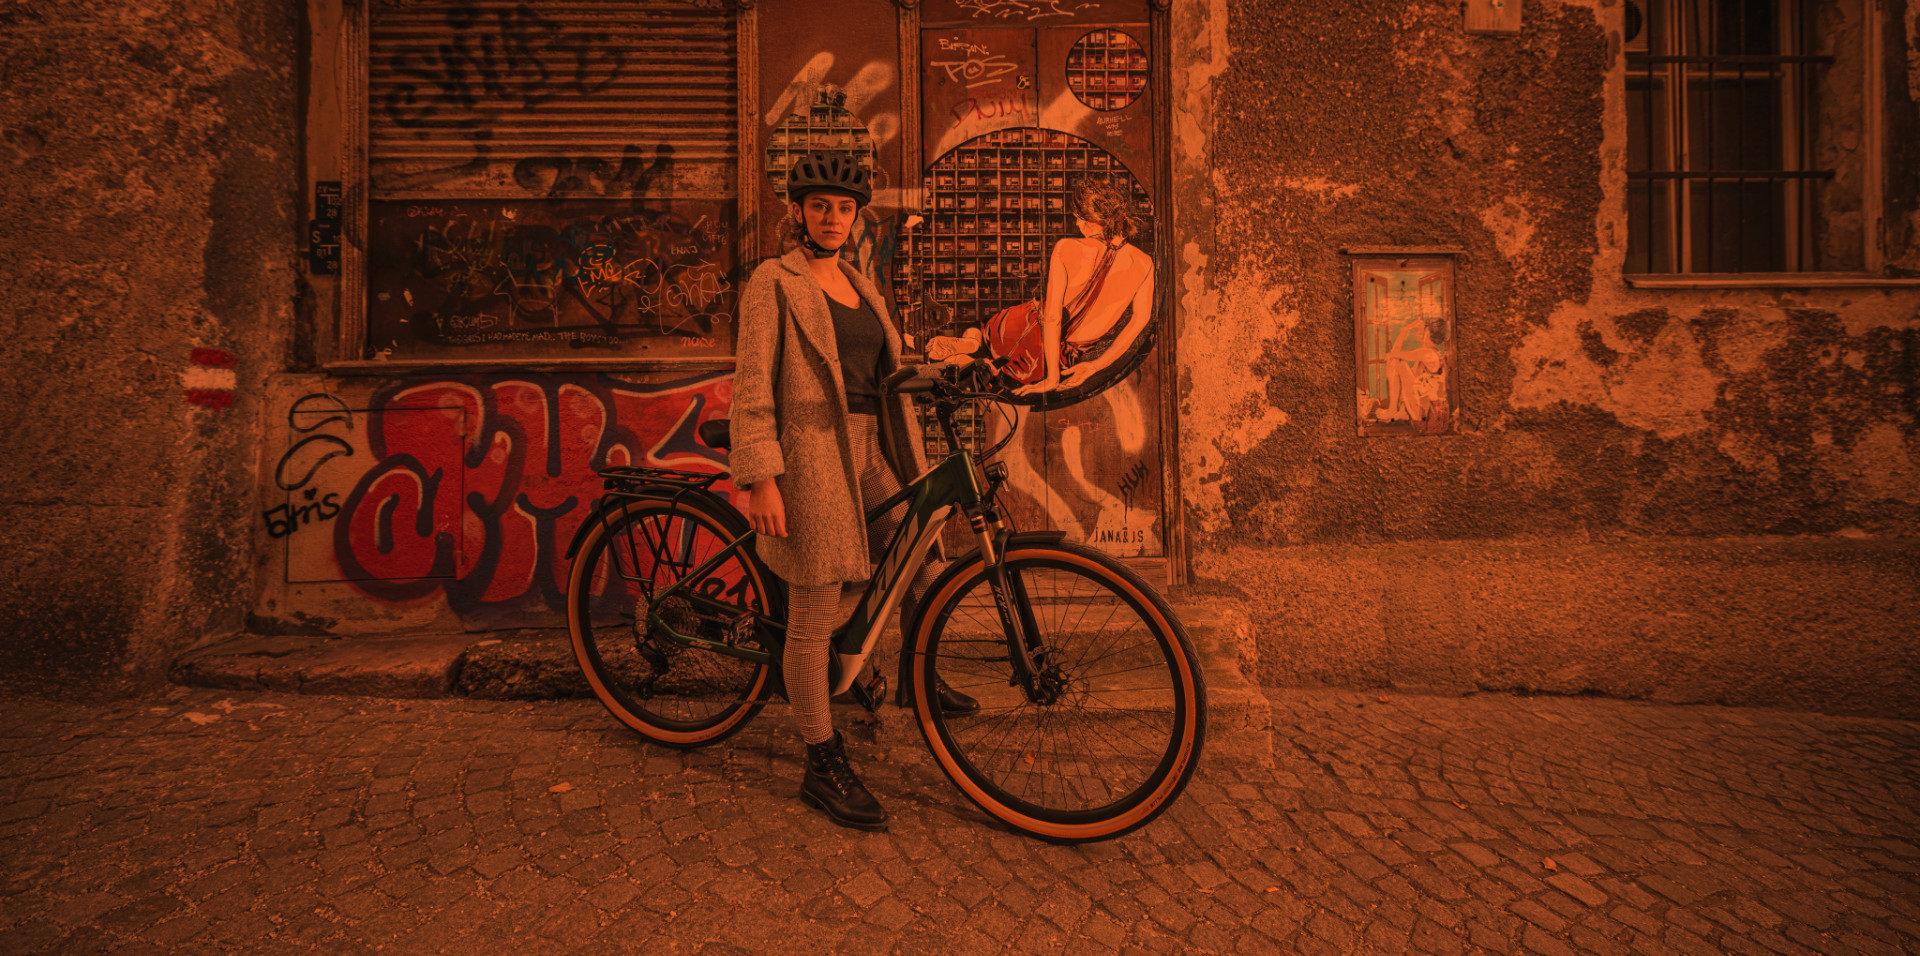 KTM Citybike